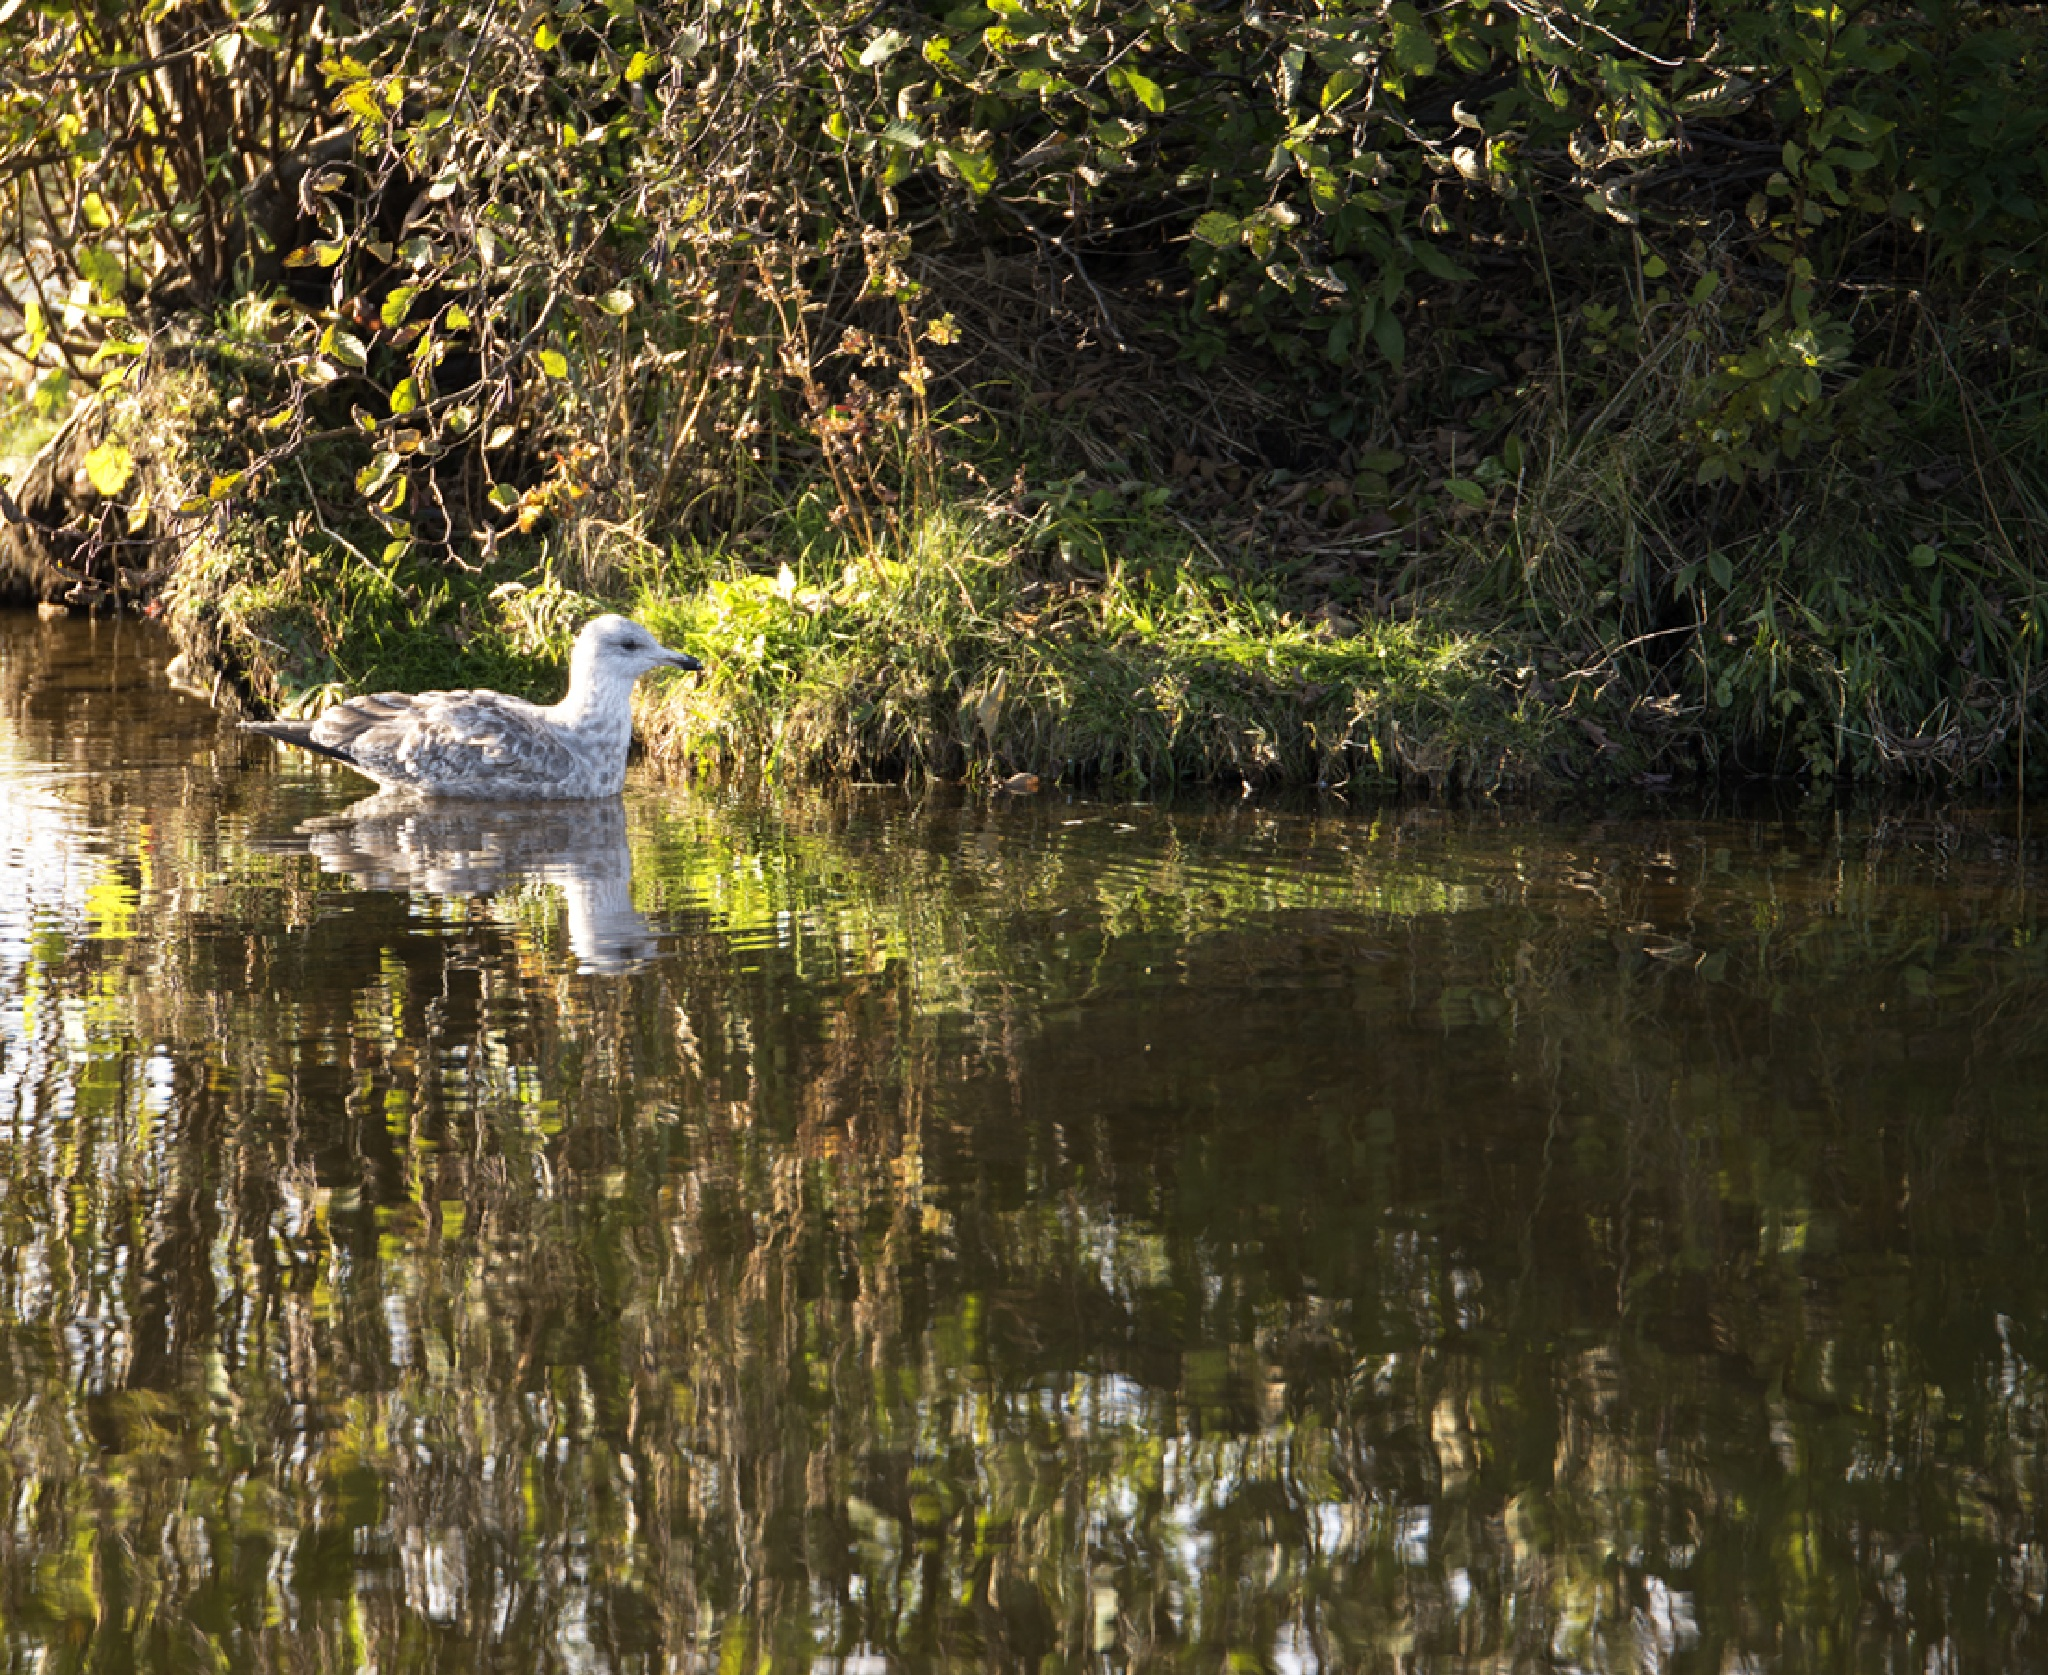 Gull at Rest by Wayne L. Talbot